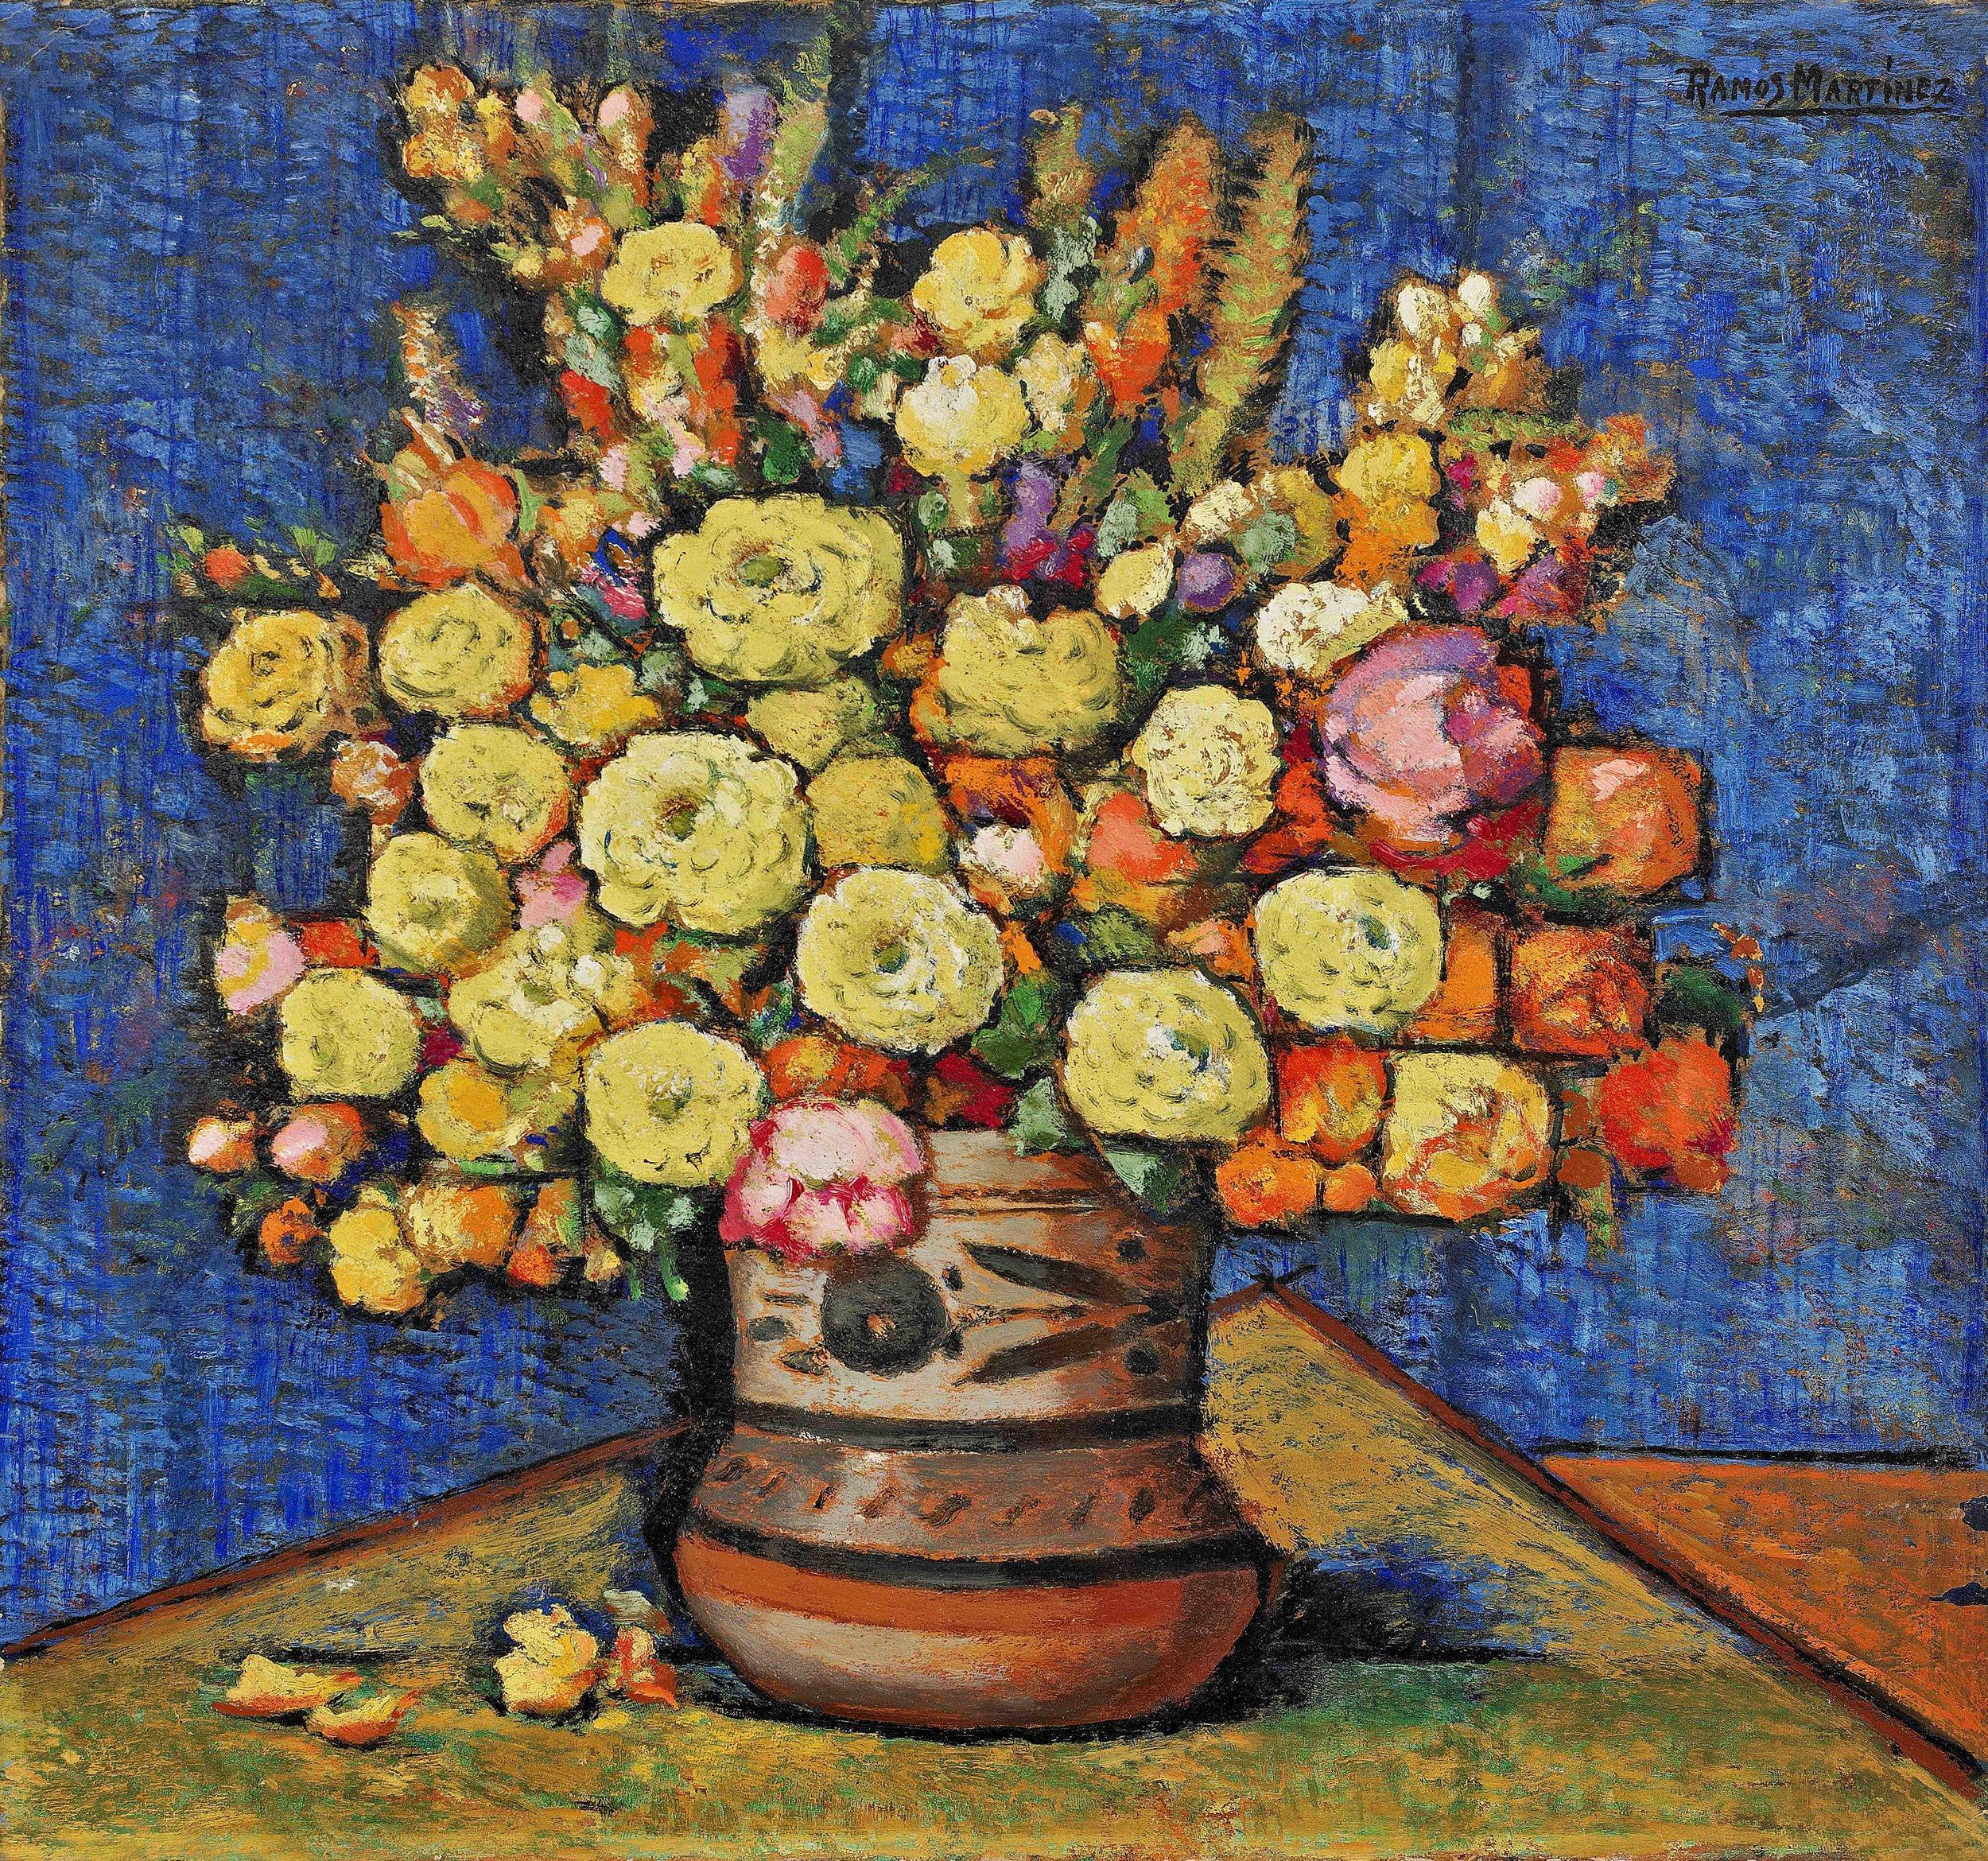 Flores en Jarro Mexicano / Flowers in a Mexican Vase  ca. 1936 oil on board / óleo sobre tabla  14.5 x 15.3 inches; 36.8 x 38.7 centímetros Private collection